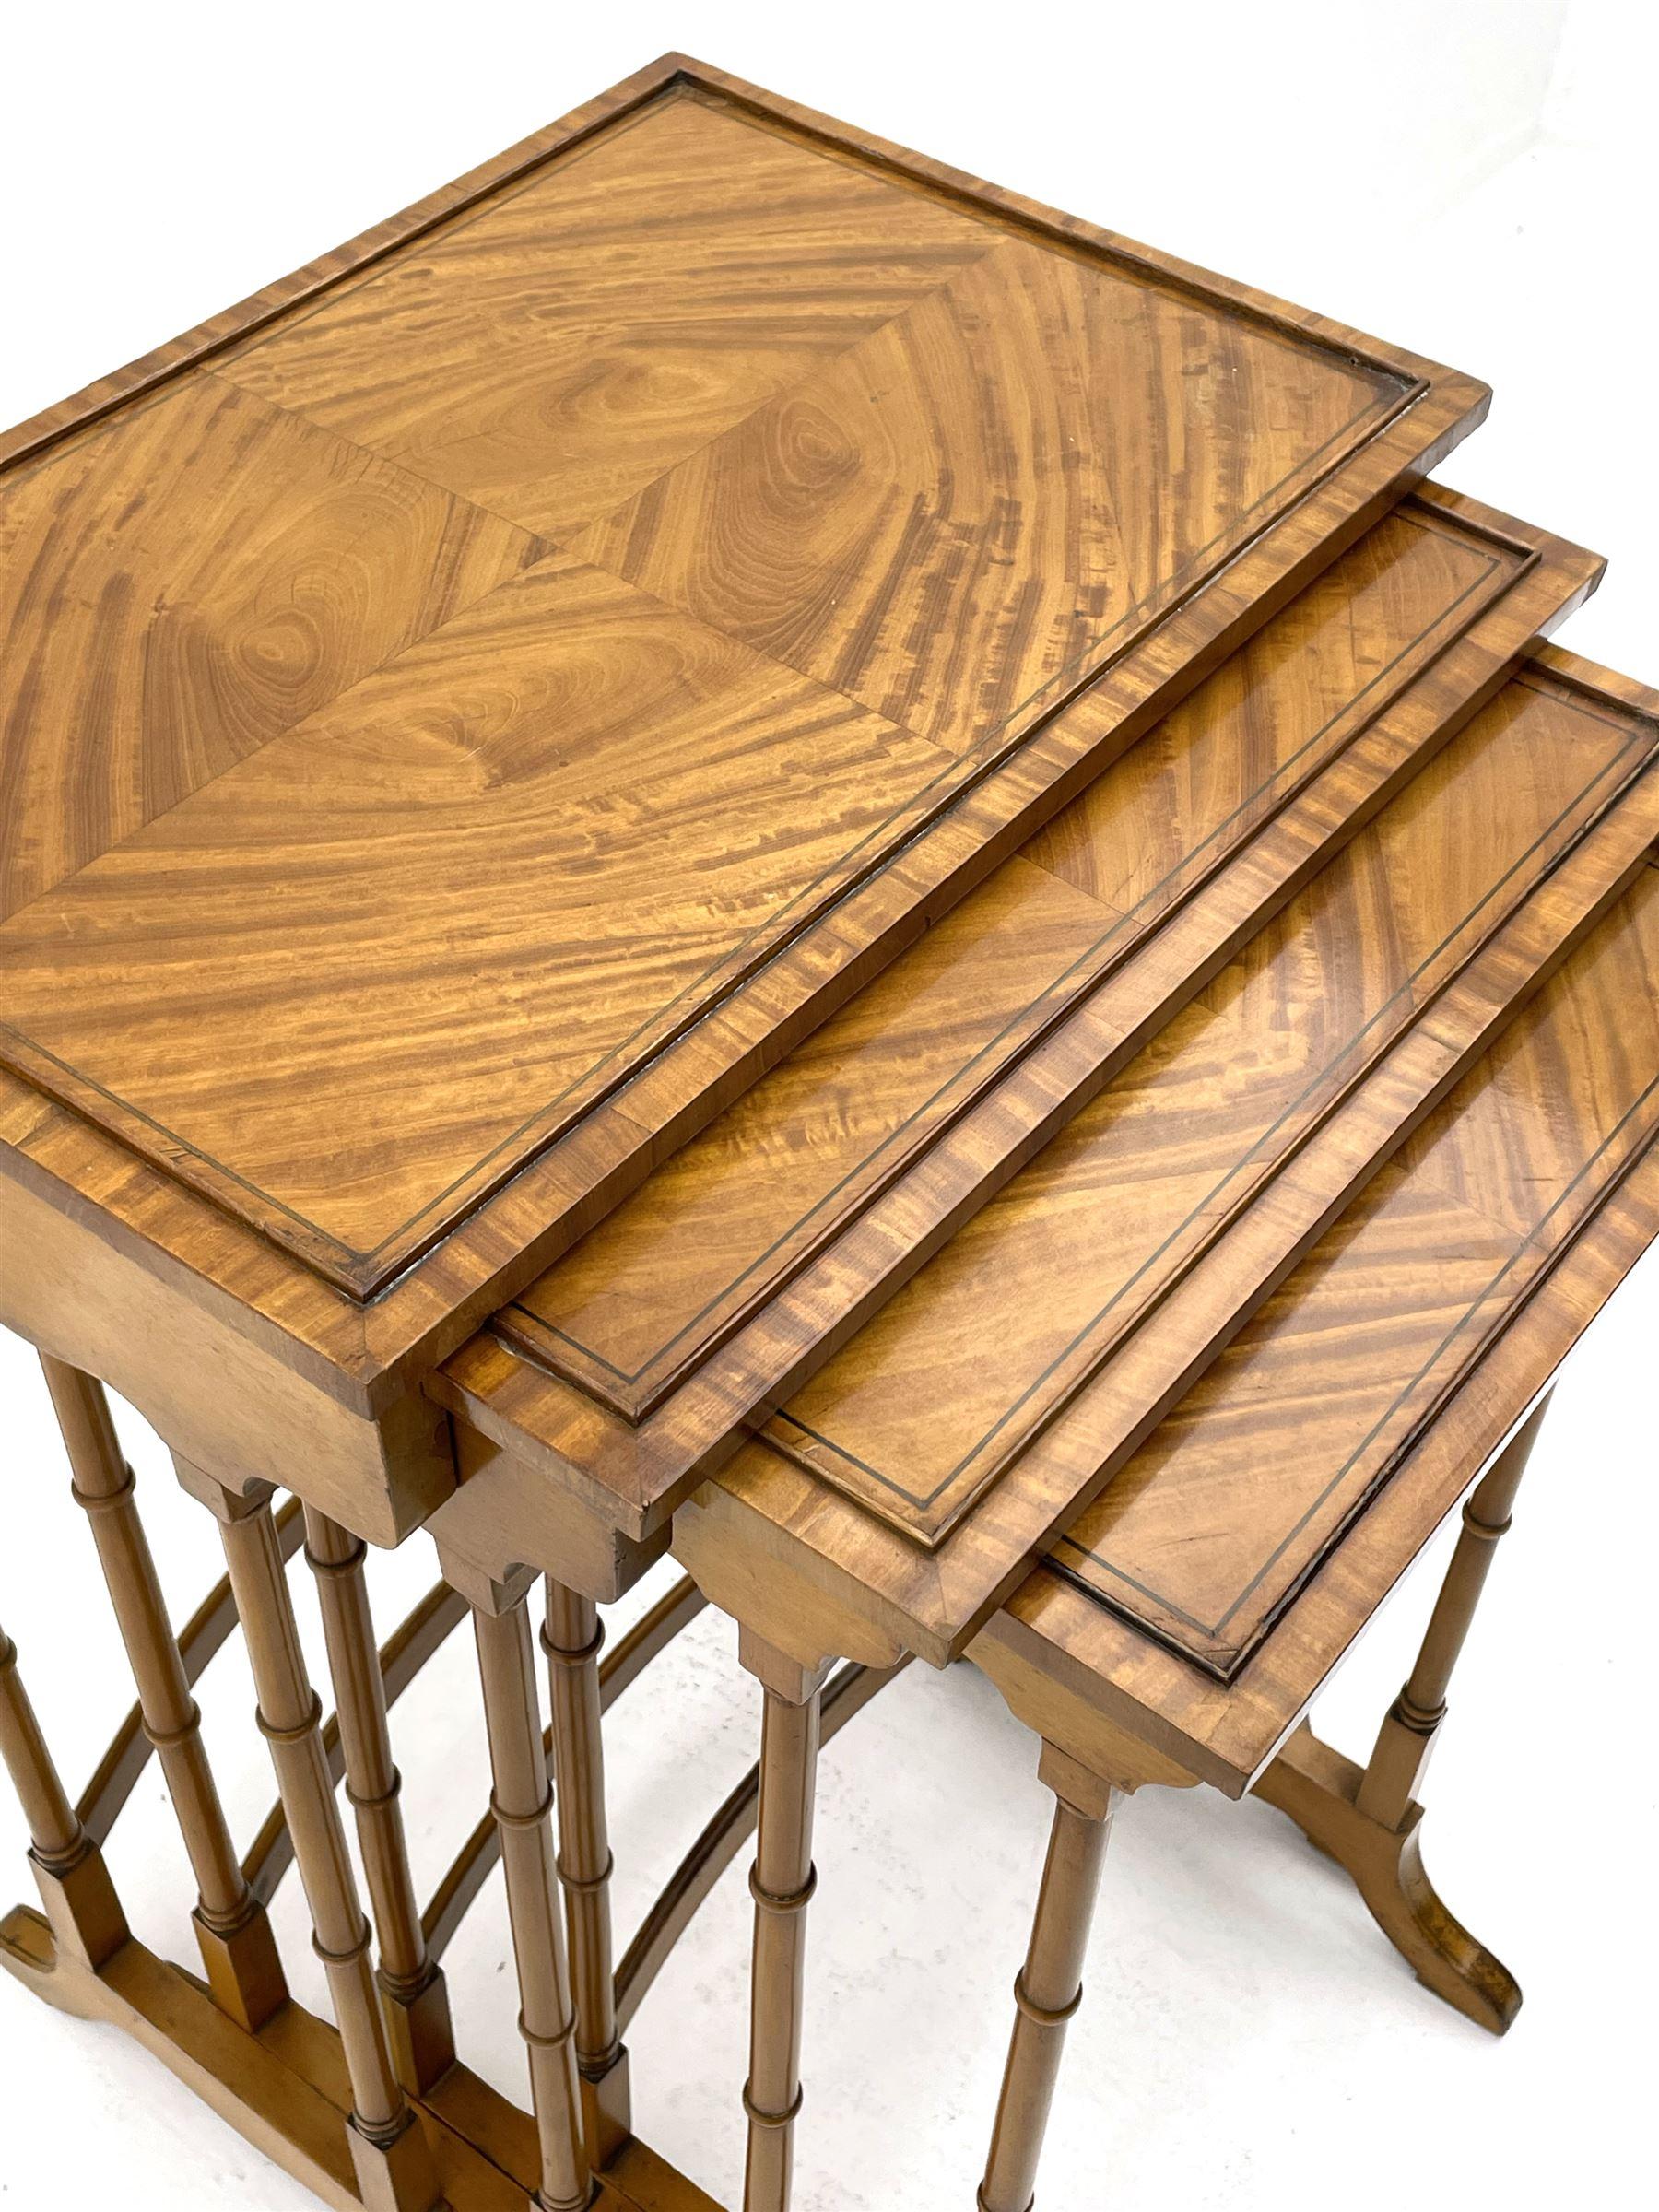 Edwardian satinwood quartetto nest of occasional tables - Image 5 of 6